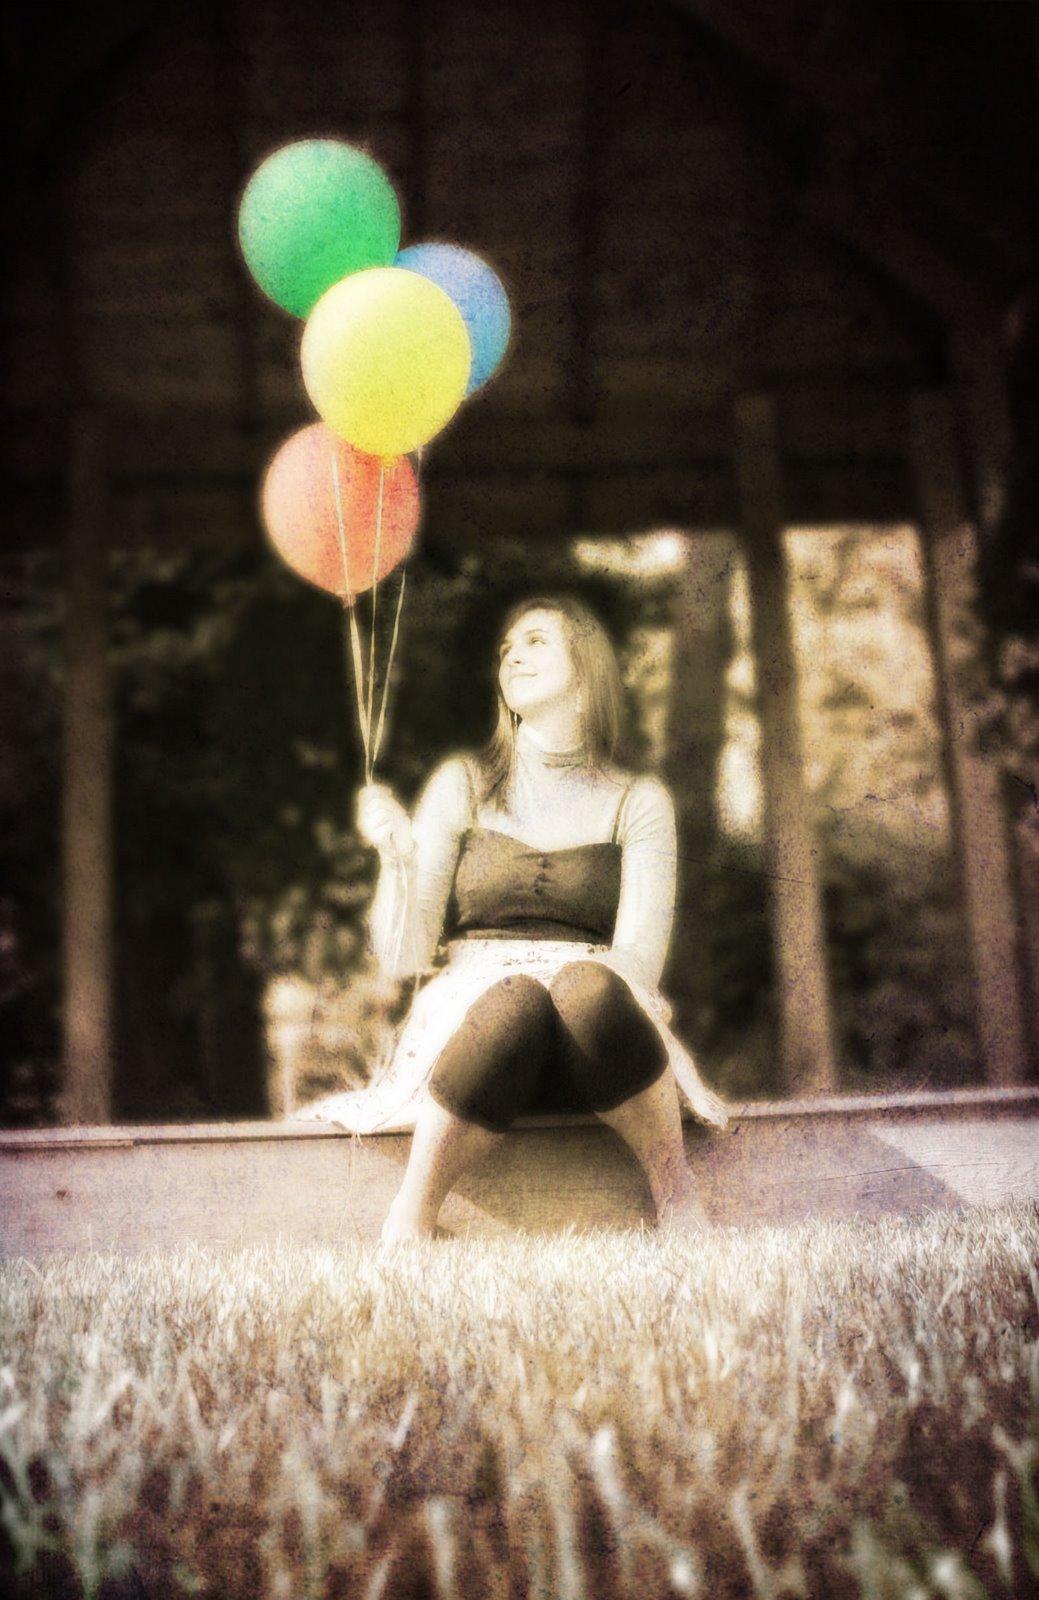 [Ellen+Balloon.jpg]